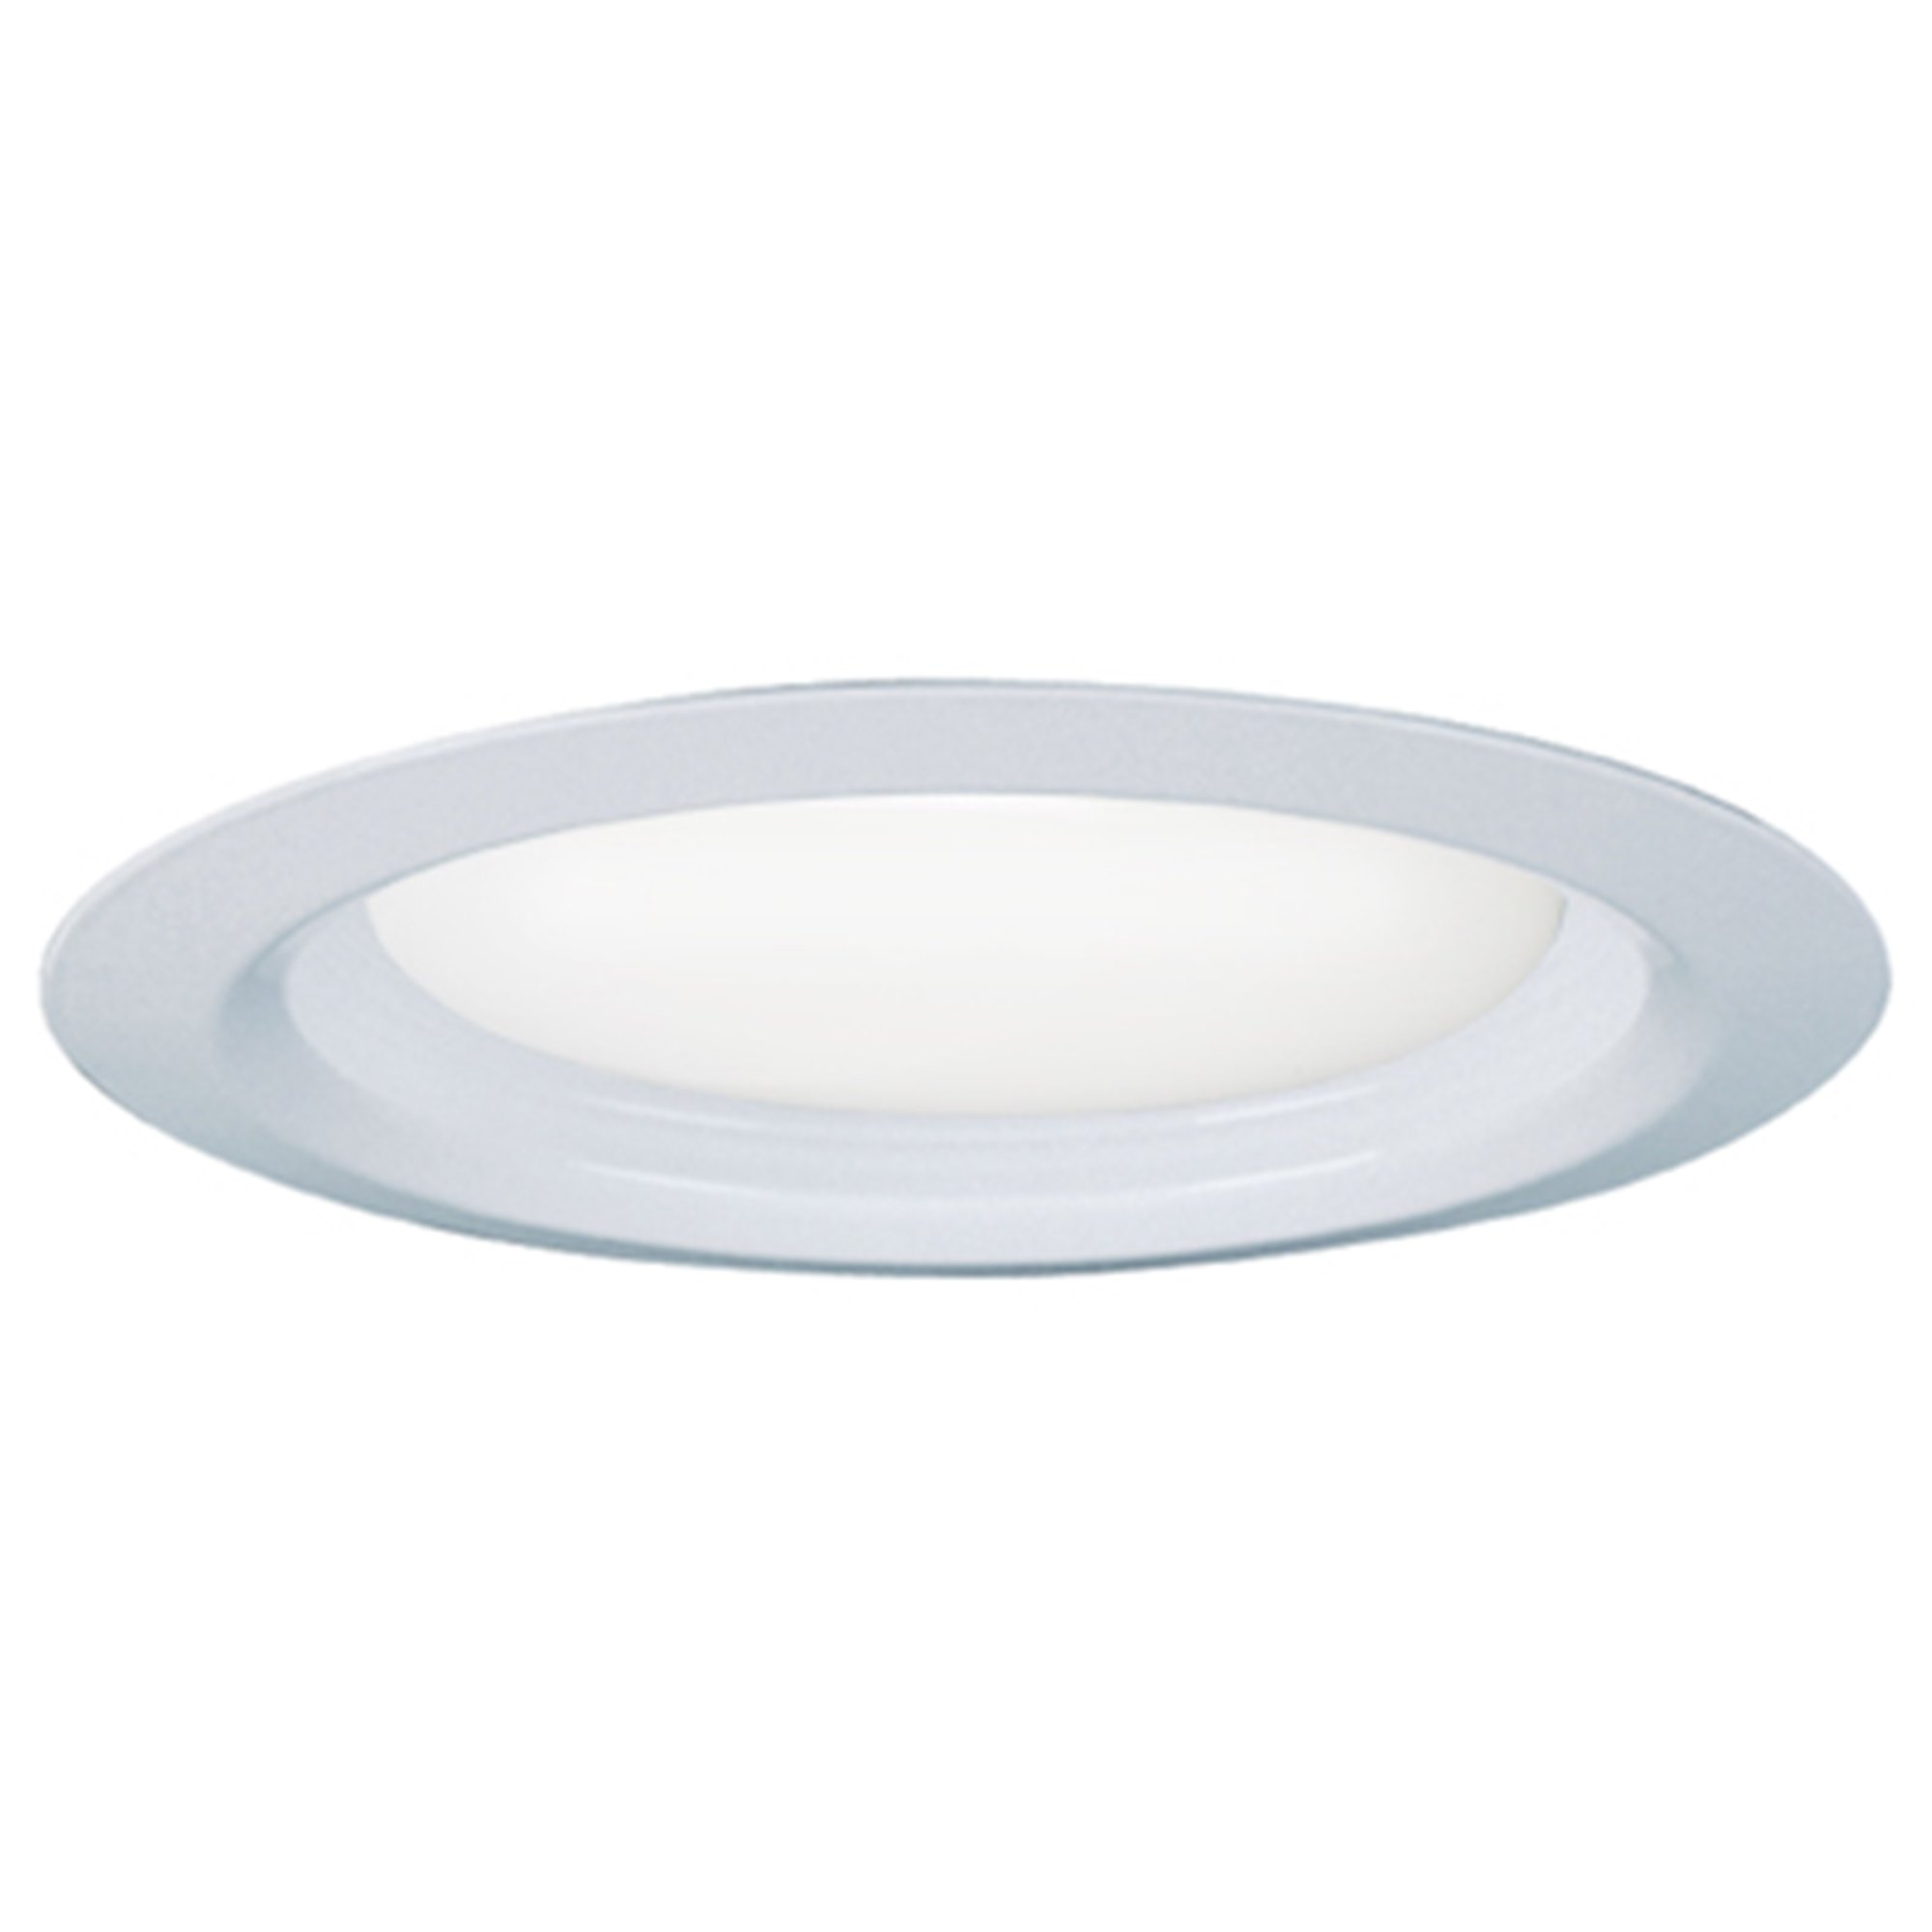 Lithonia Lighting LK7B2MW BR30 LED M6 6-Inch Matte White Recessed Downlighting